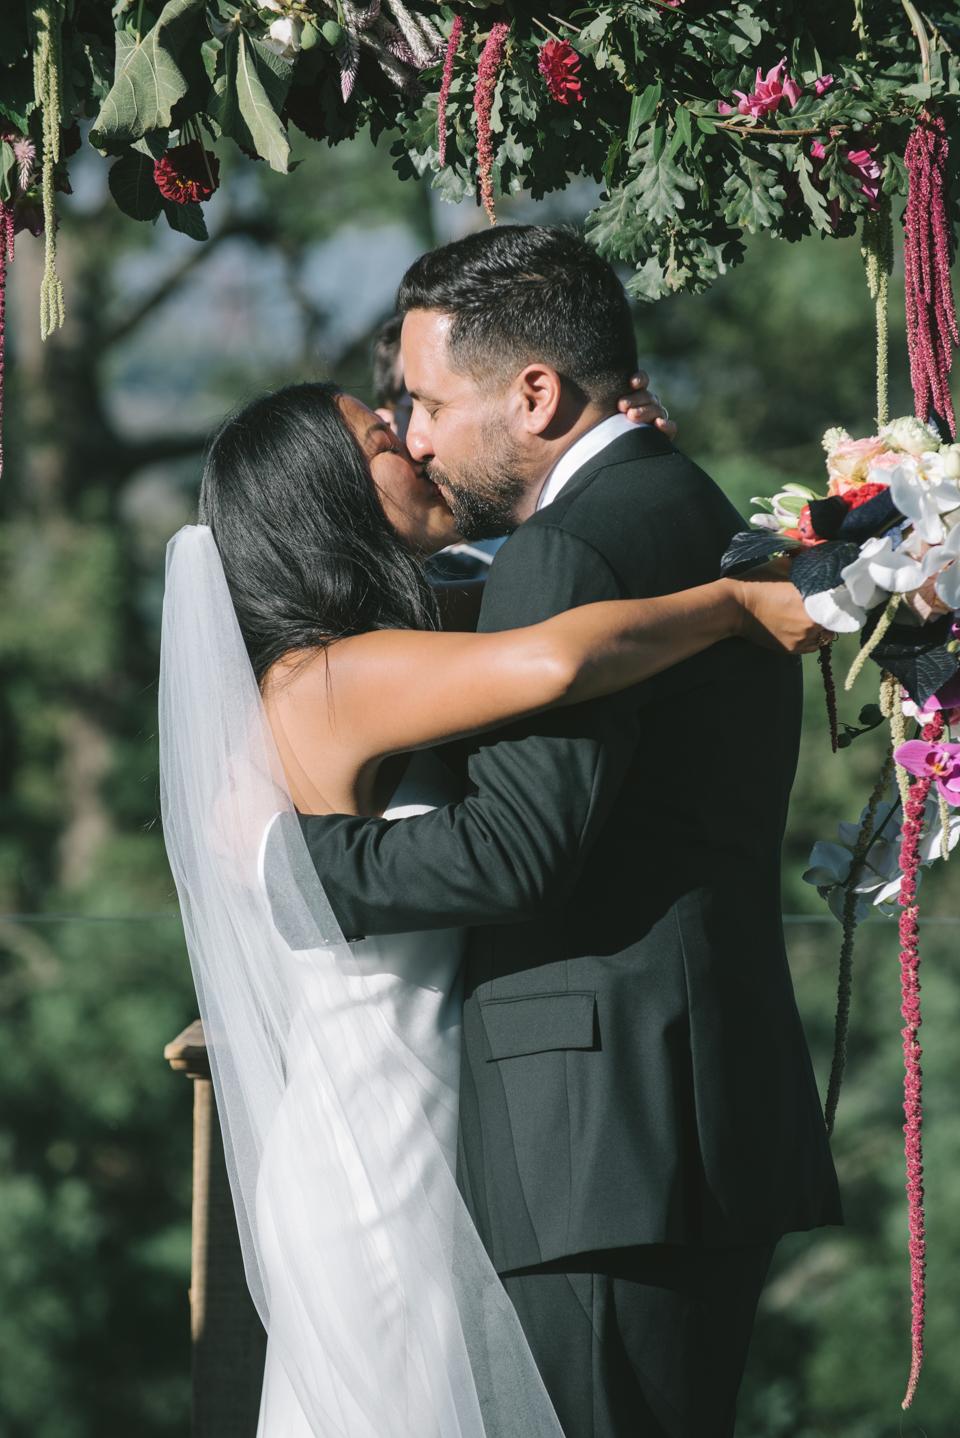 Grace and Alfonso wedding Clouds Estate Stellenbosch South Africa shot by dna photographers 497.jpg